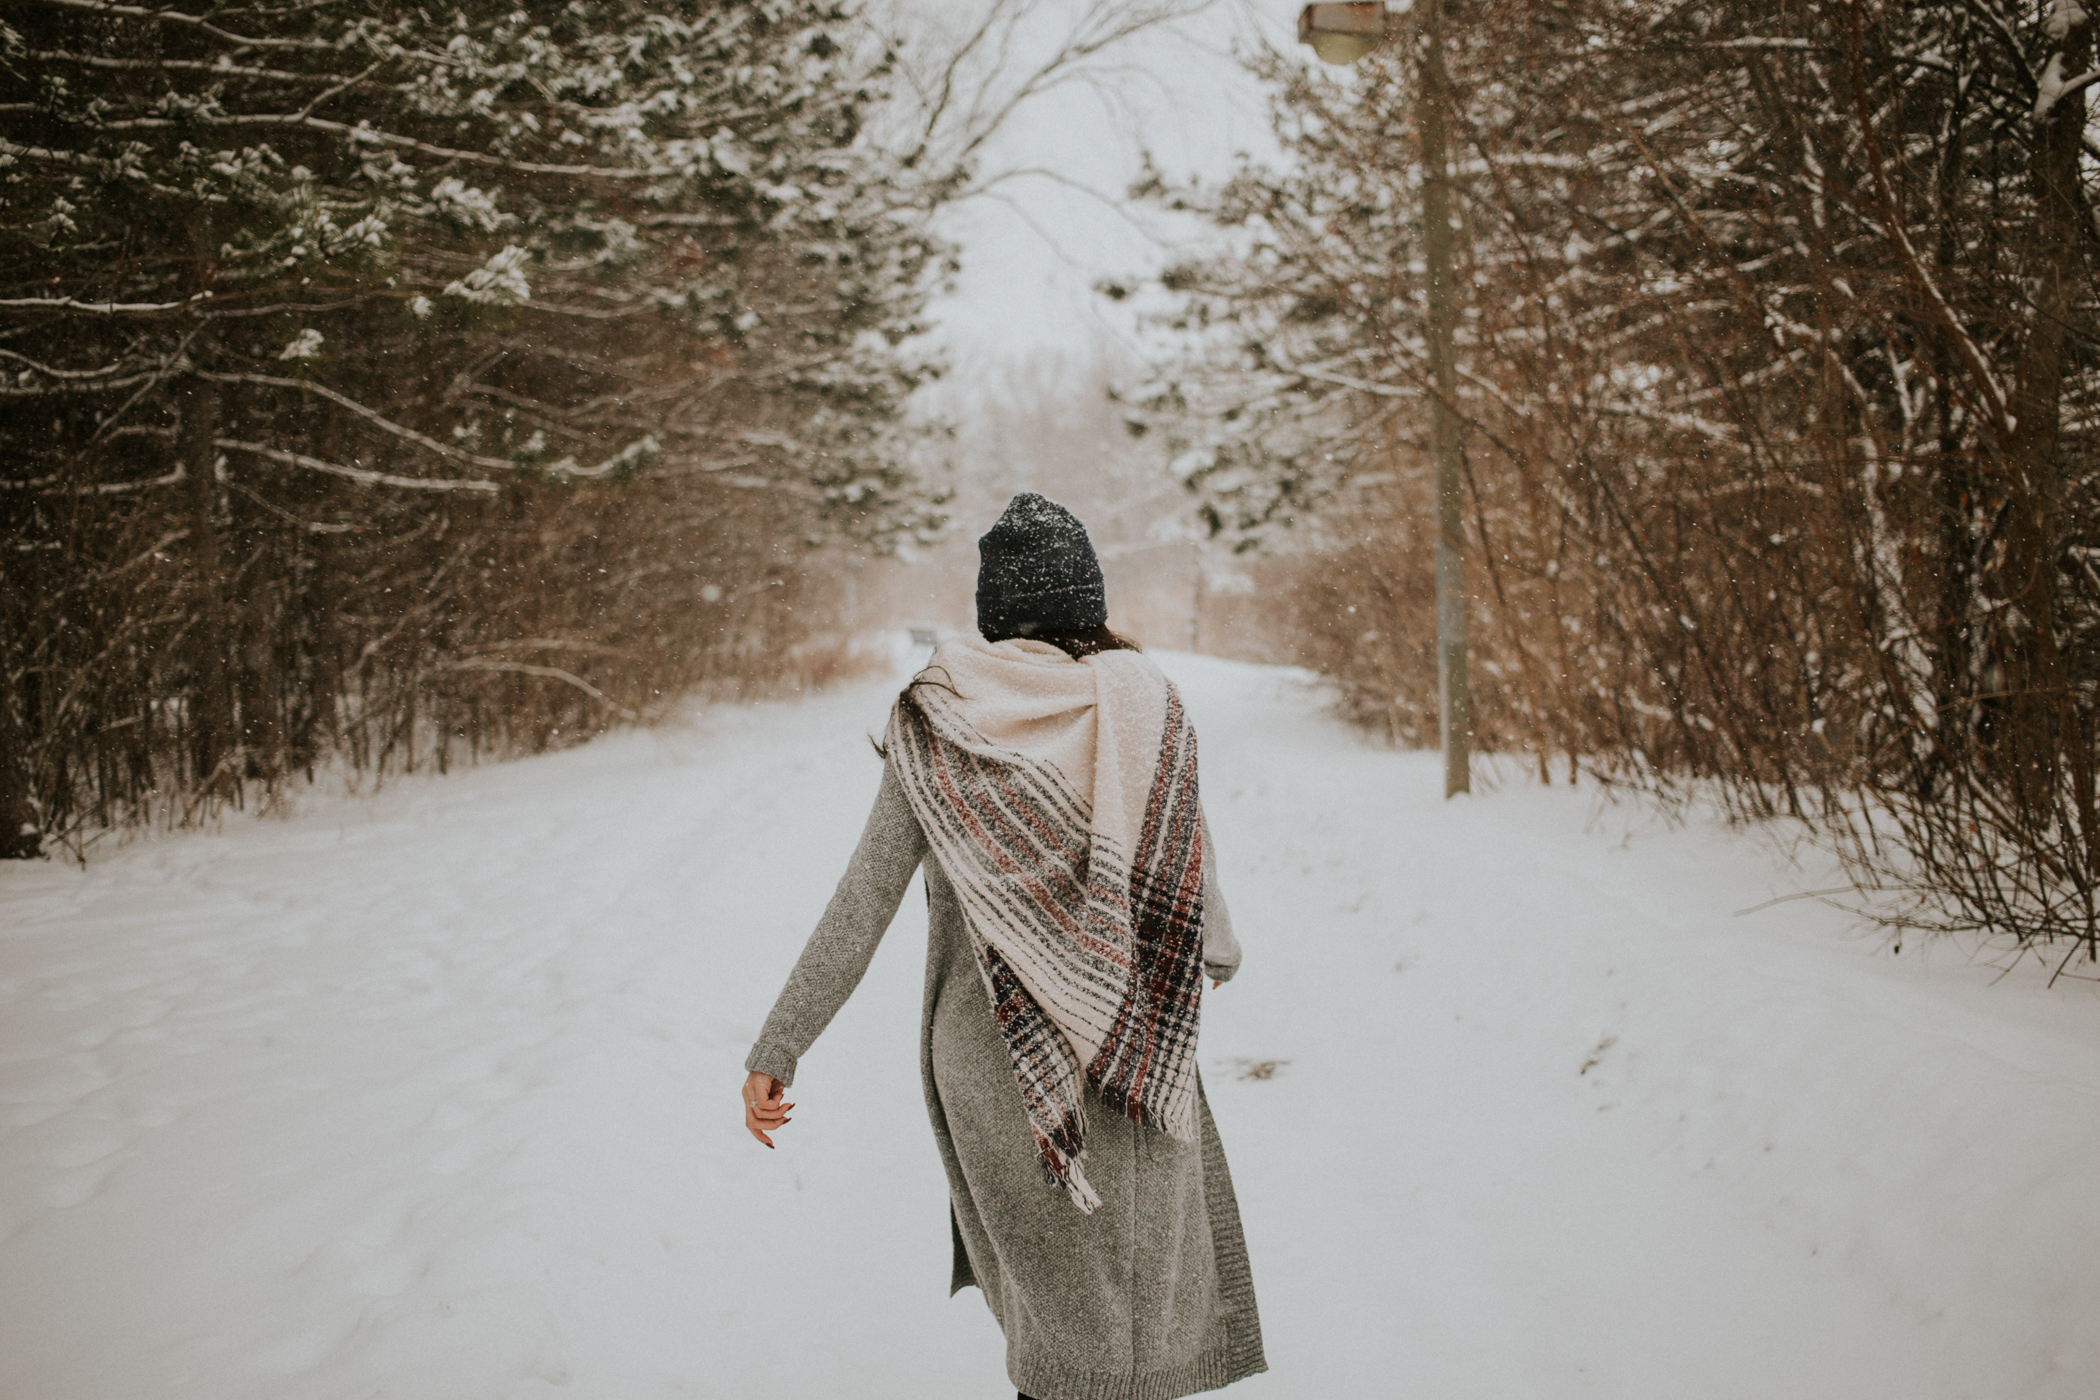 Girl walking down snowy path in toronto